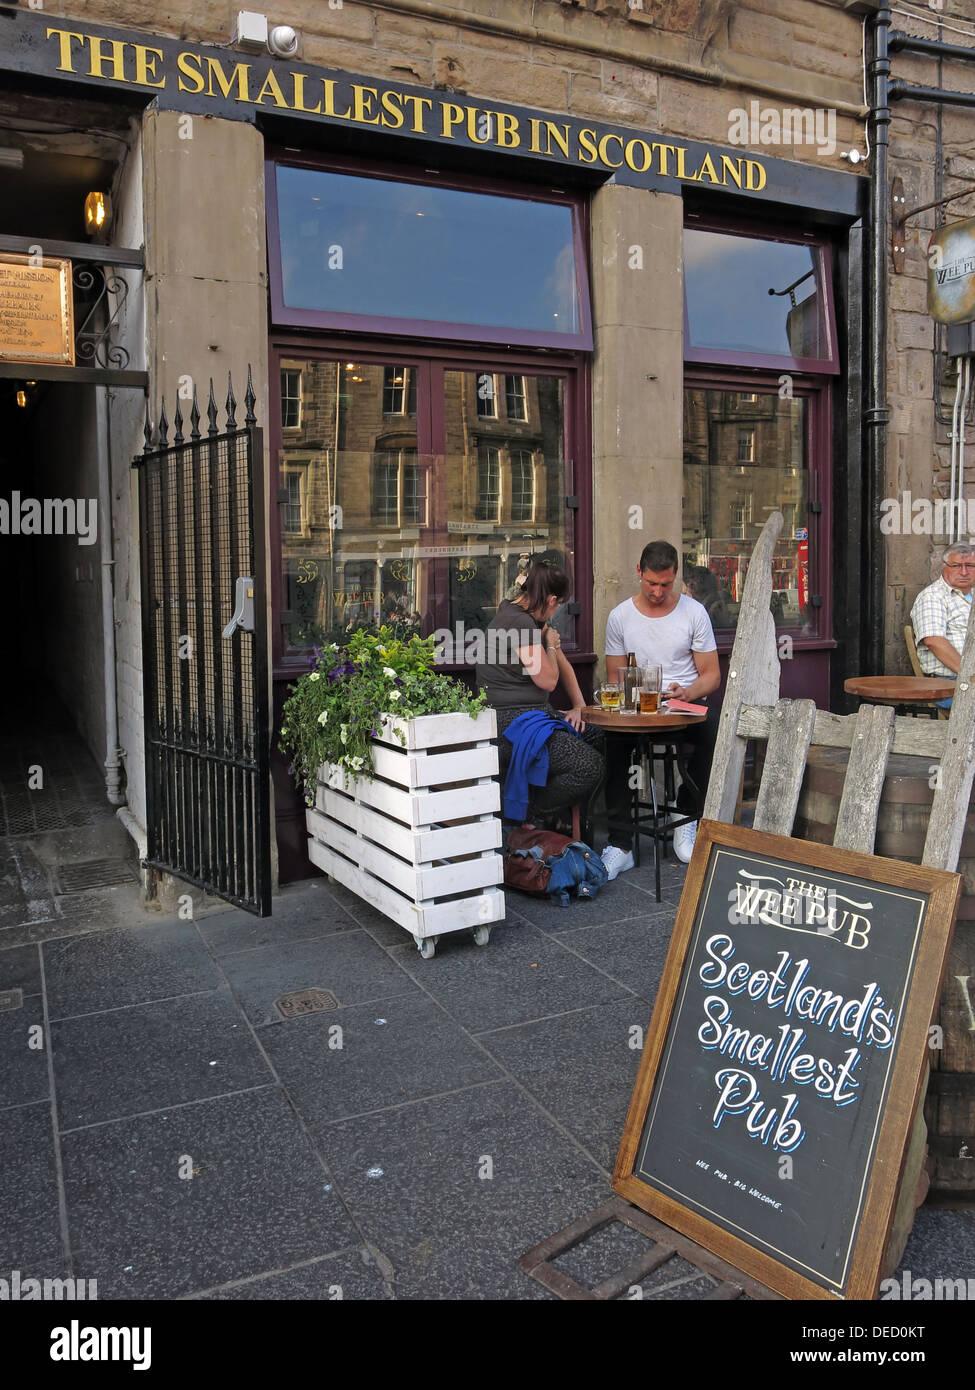 The Smallest Pub in Scotland, Grassmarket, Edinburgh, Scotland, UK - Stock Image